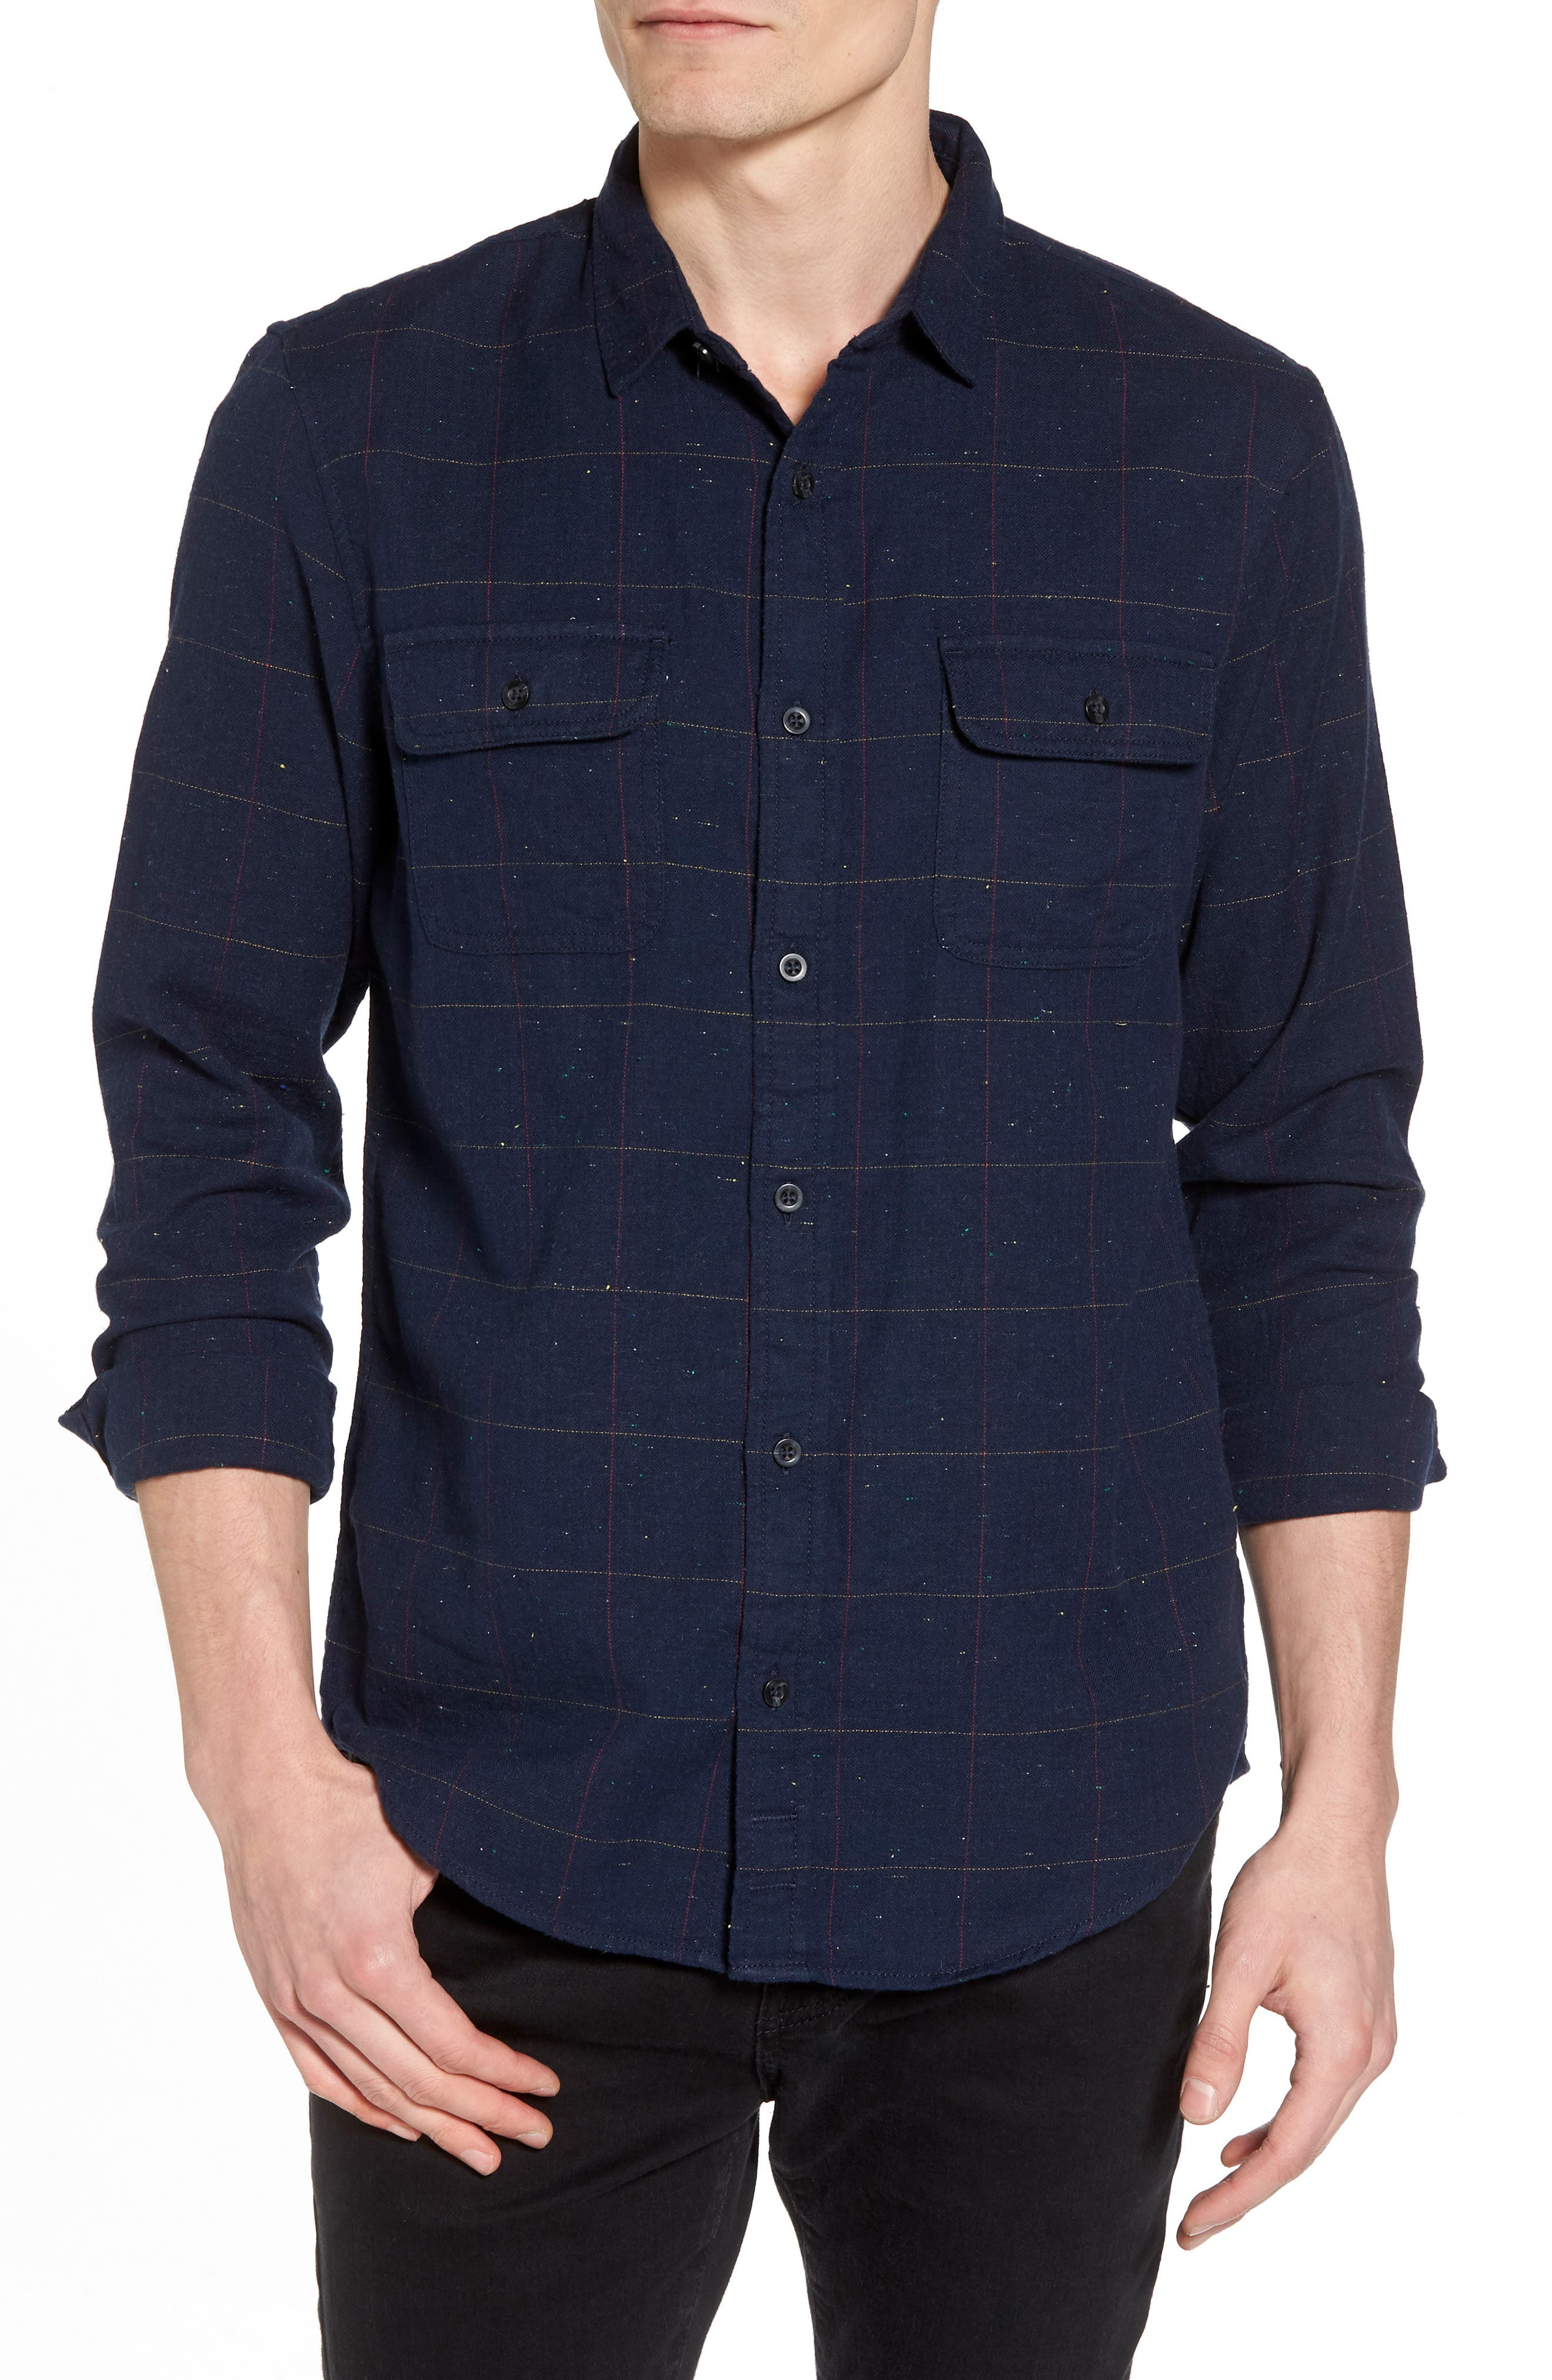 Herringbone Plaid Flannel Shirt,                             Main thumbnail 1, color,                             Black - White Nepped Tartan